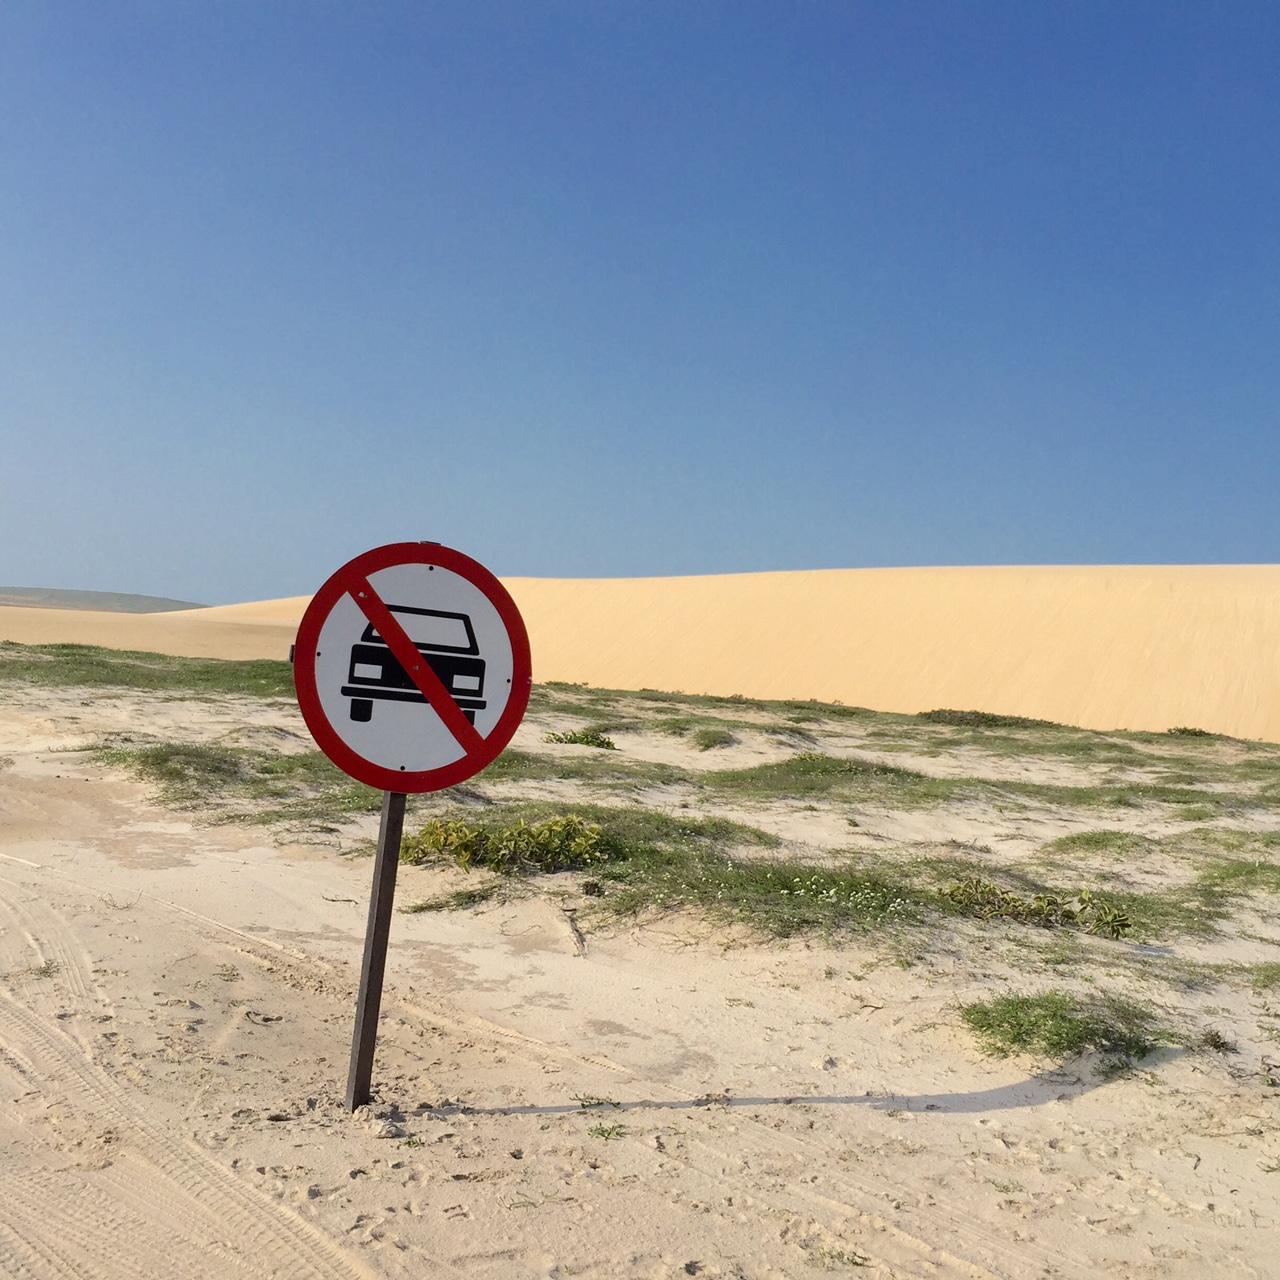 come raggiungere-jericoacoara- macchina-dune-parco